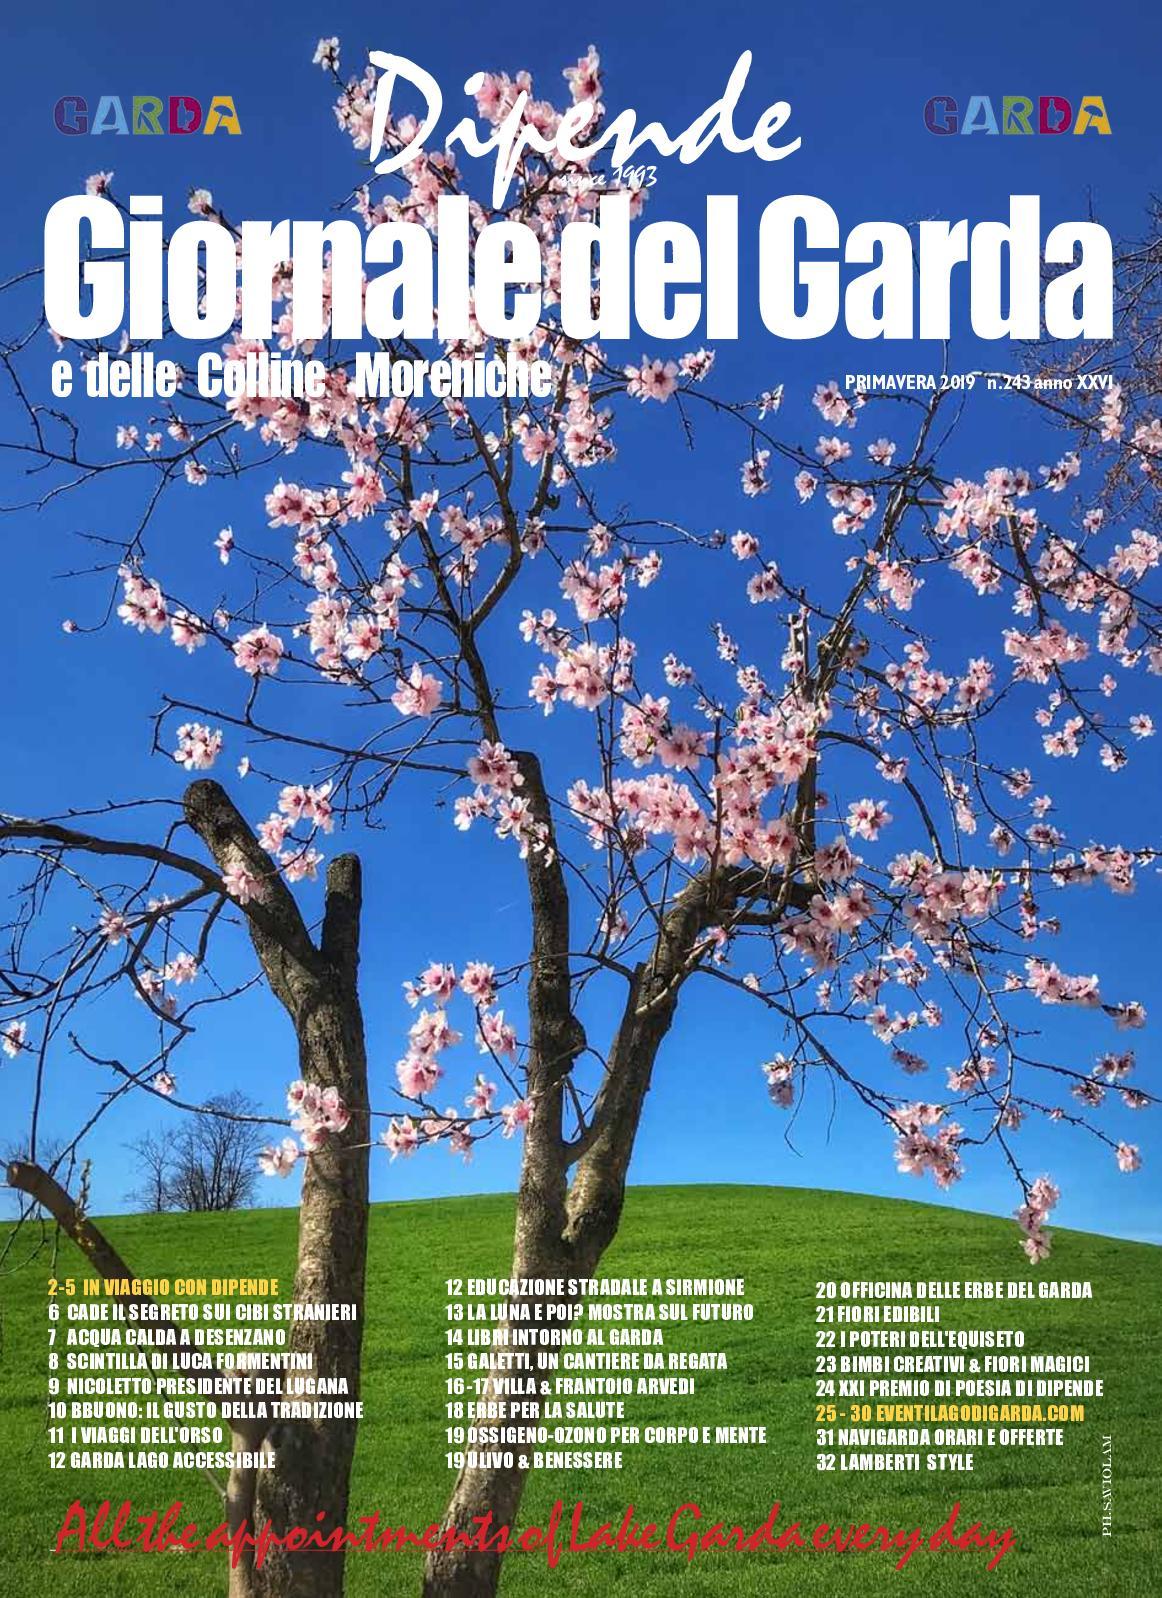 Vivaio Peschiera Del Garda calaméo - 243 dipende giornale del garda primavera 2019